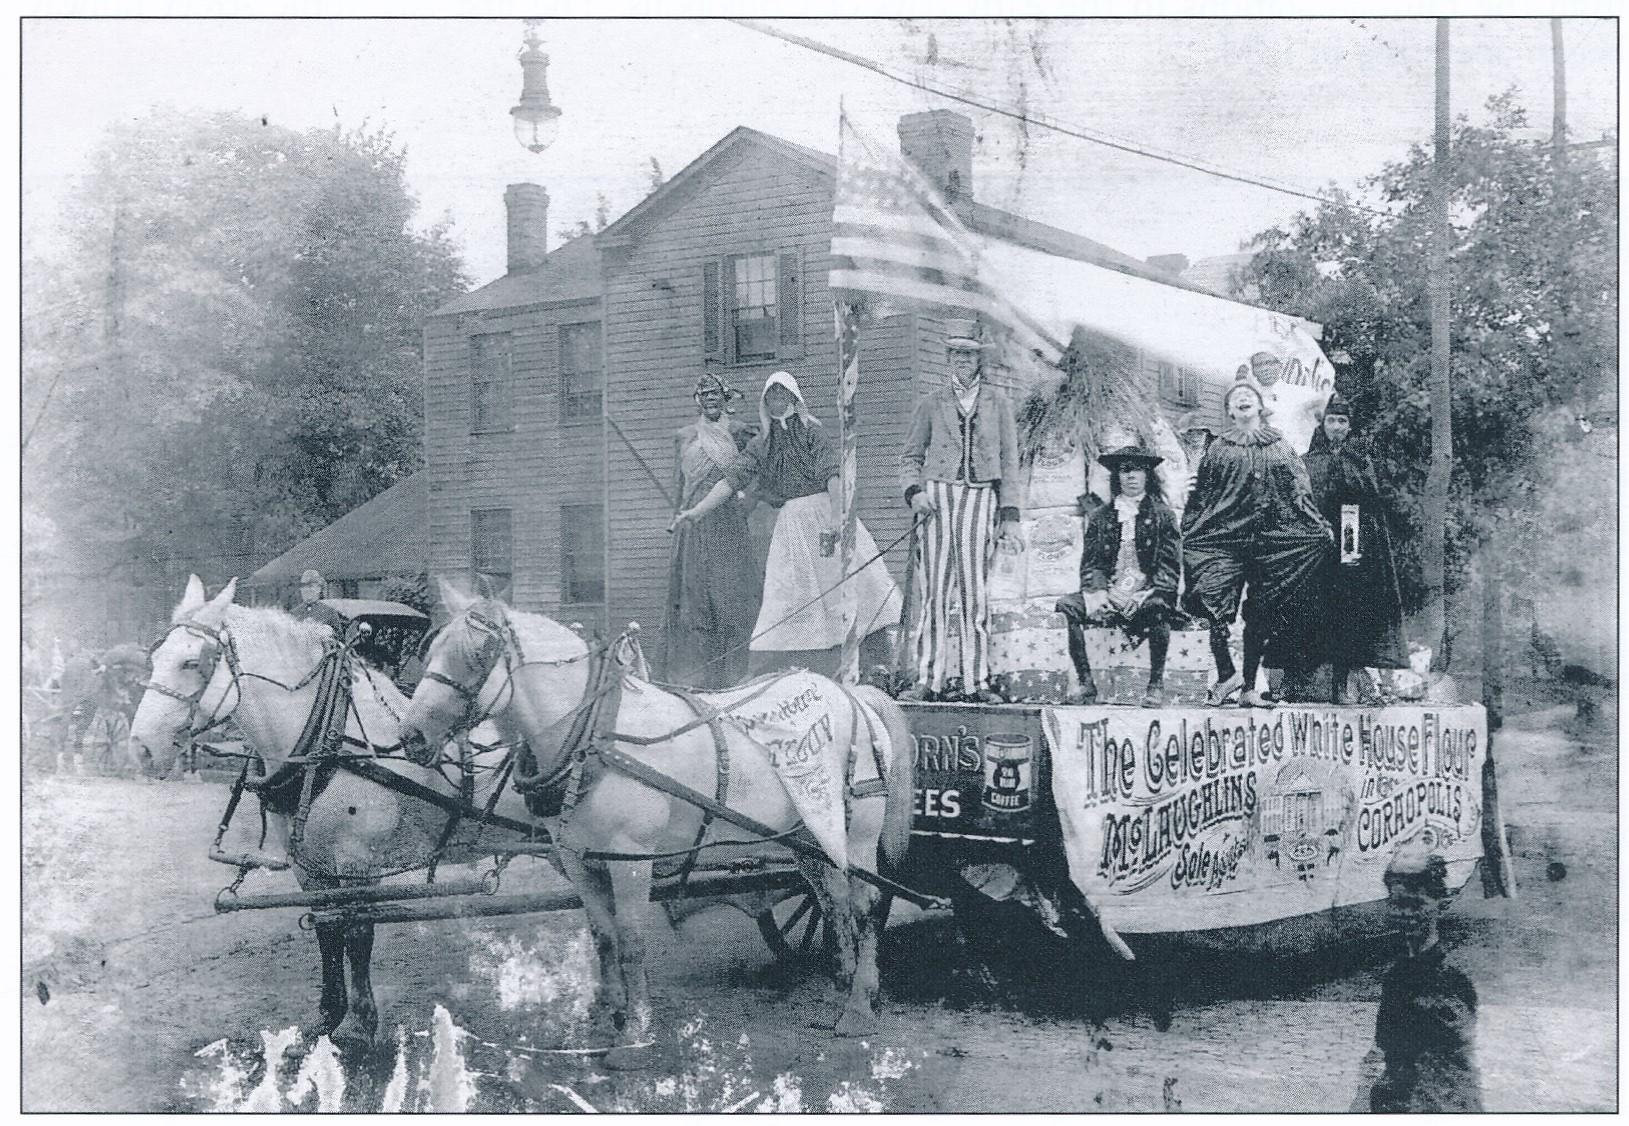 1911 Sewickley Bridge Celebration (2).jpg